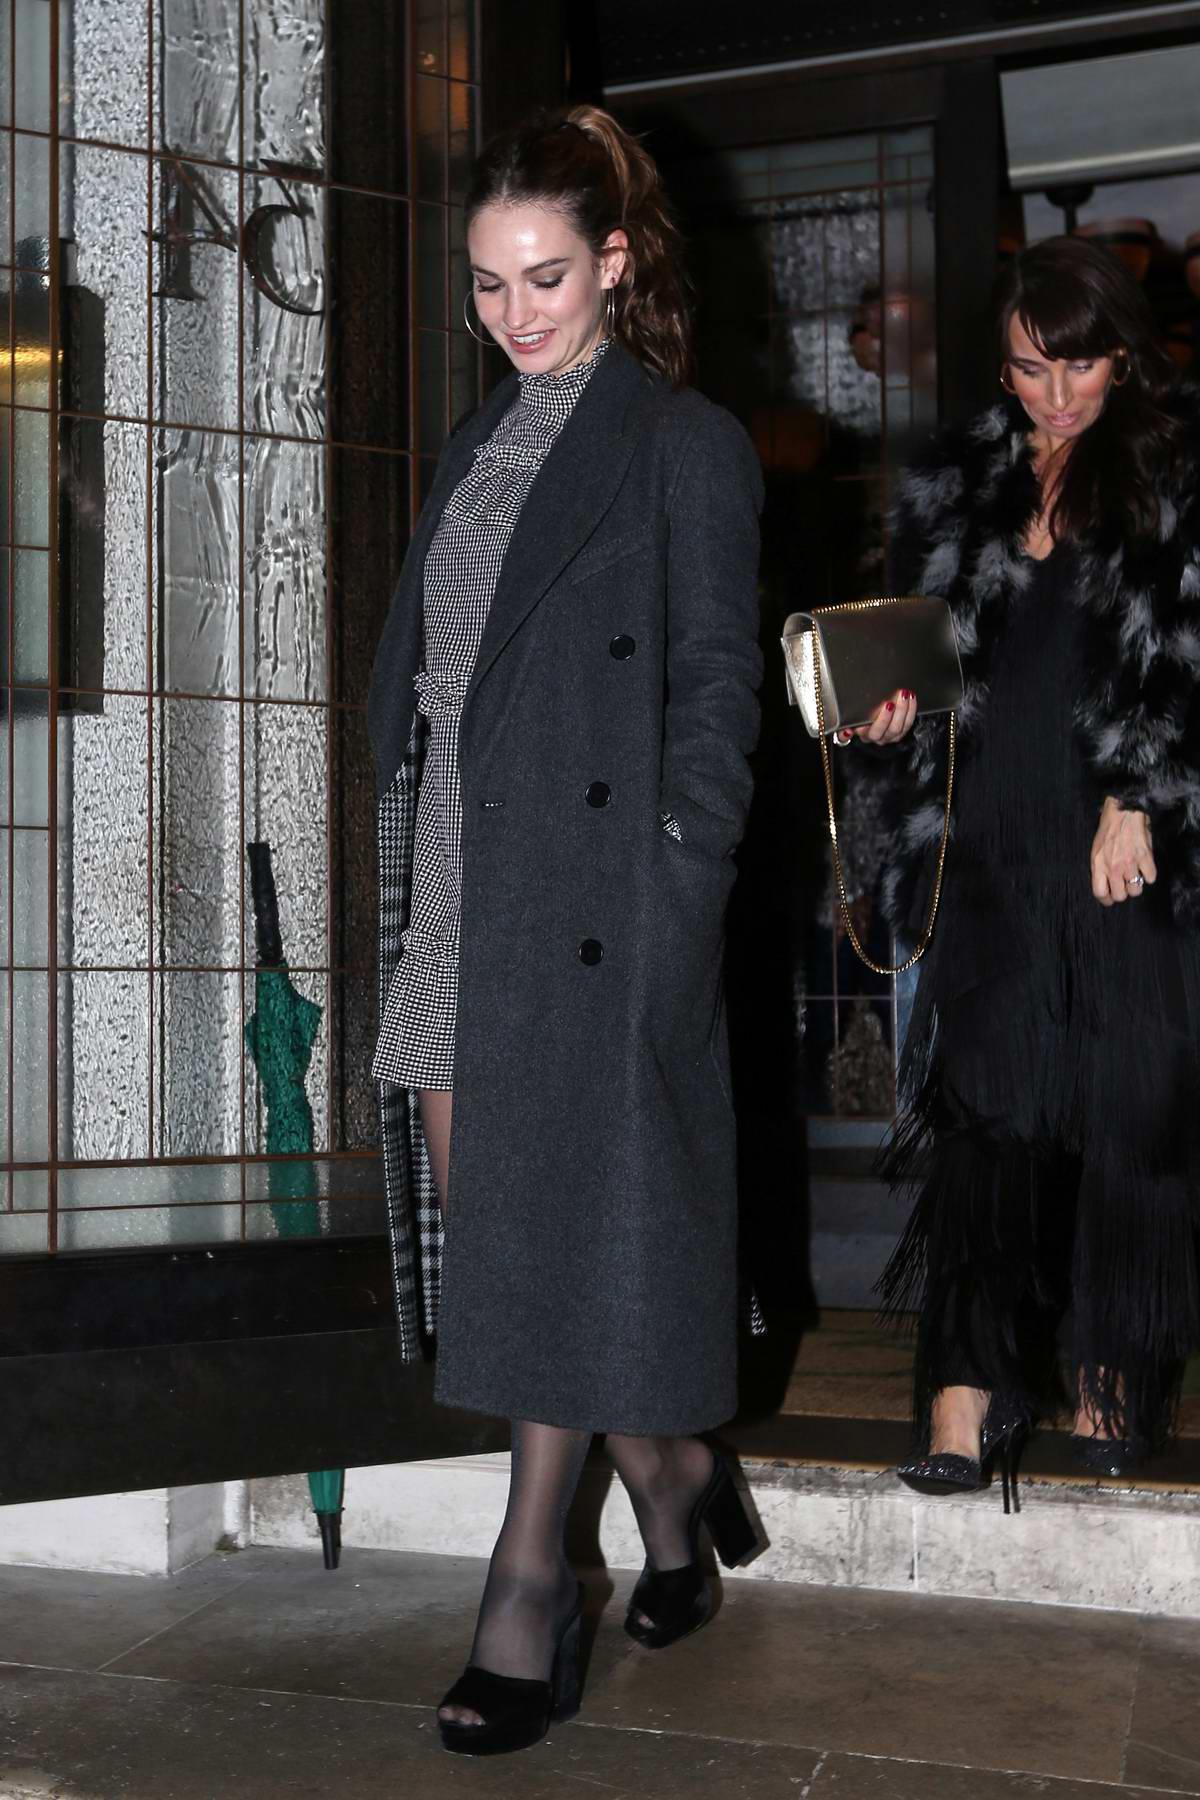 Lily James and Matt Smith seen leaving 34 Restaurant in Mayfair, London, UK